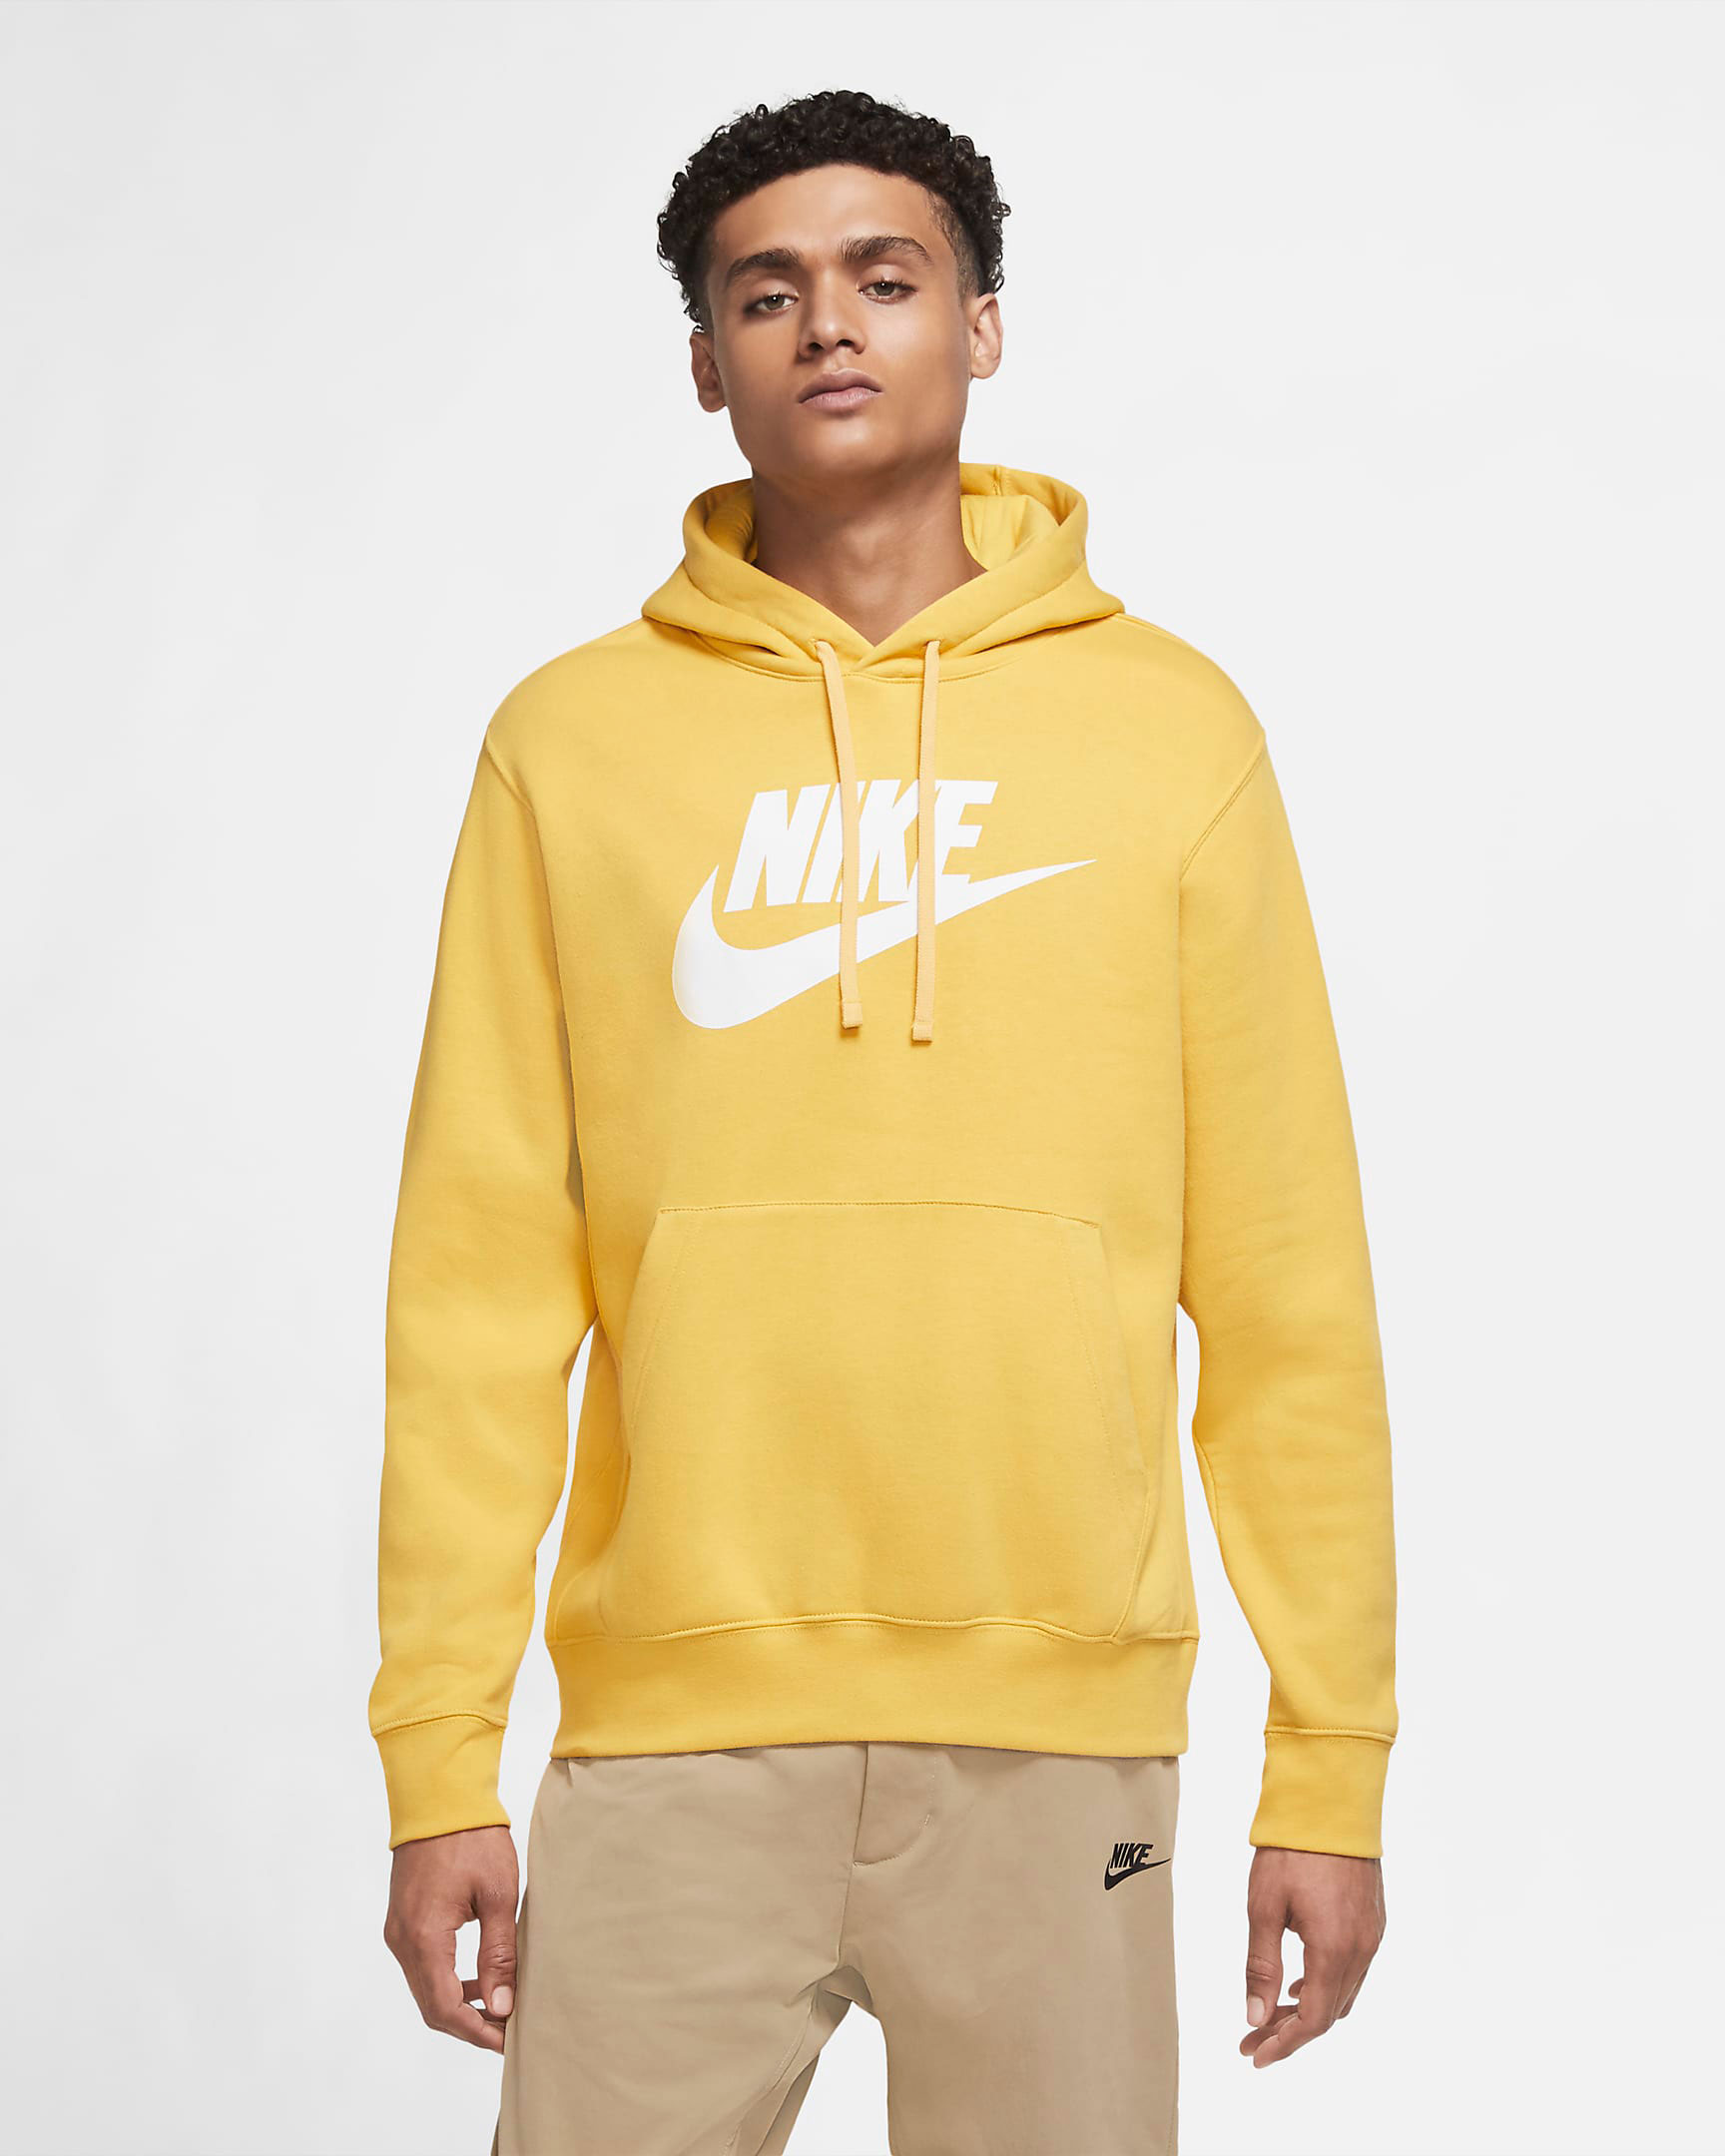 nike-air-max-1-lemonade-yellow-club-hoodie